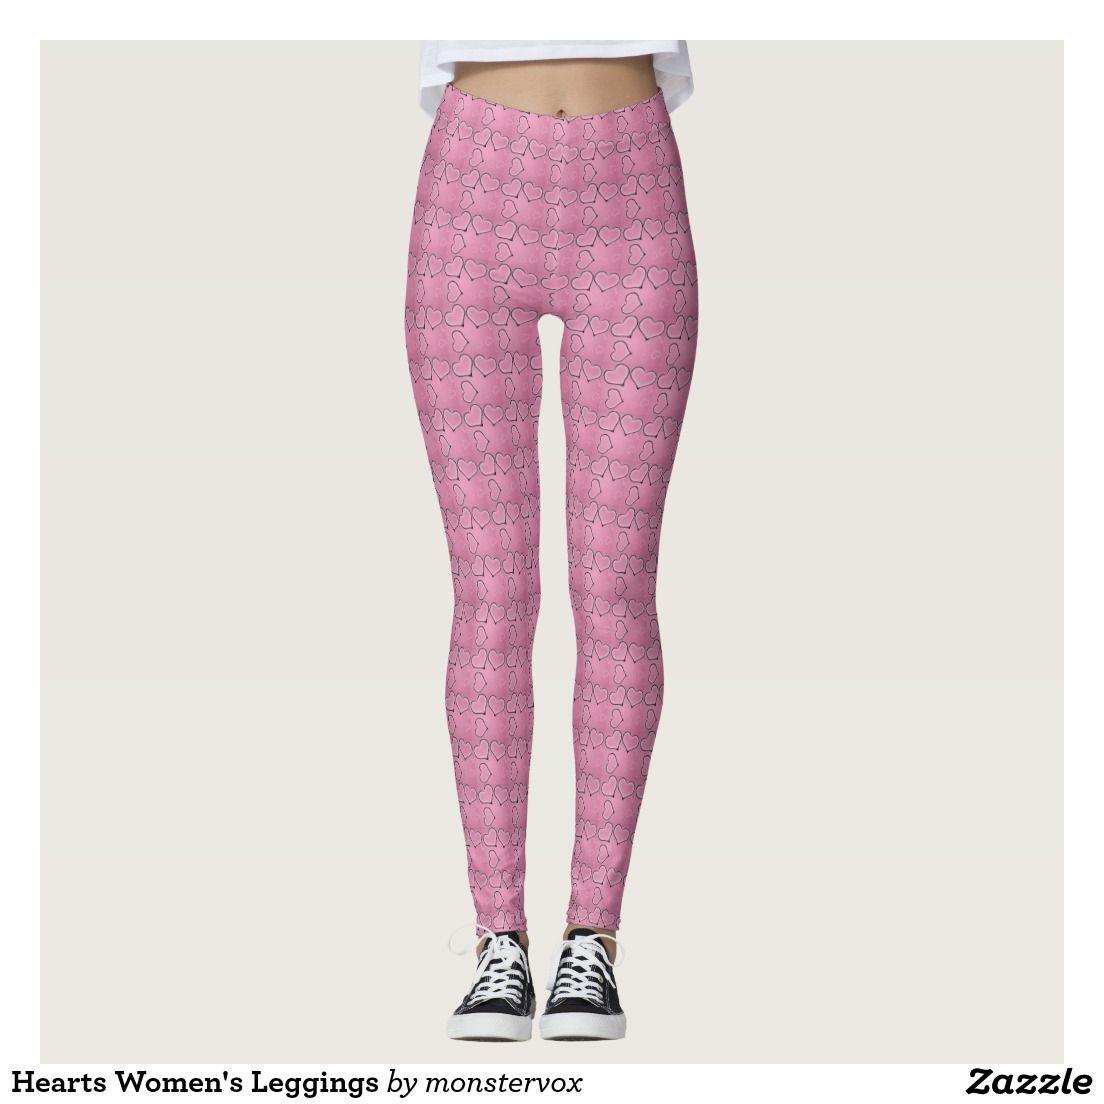 b81519469839dc Hearts Women's Leggings #Leggings #Yoga #Pants #Activewear #Sports  #Sportswear #Athletic #Fashion #Design